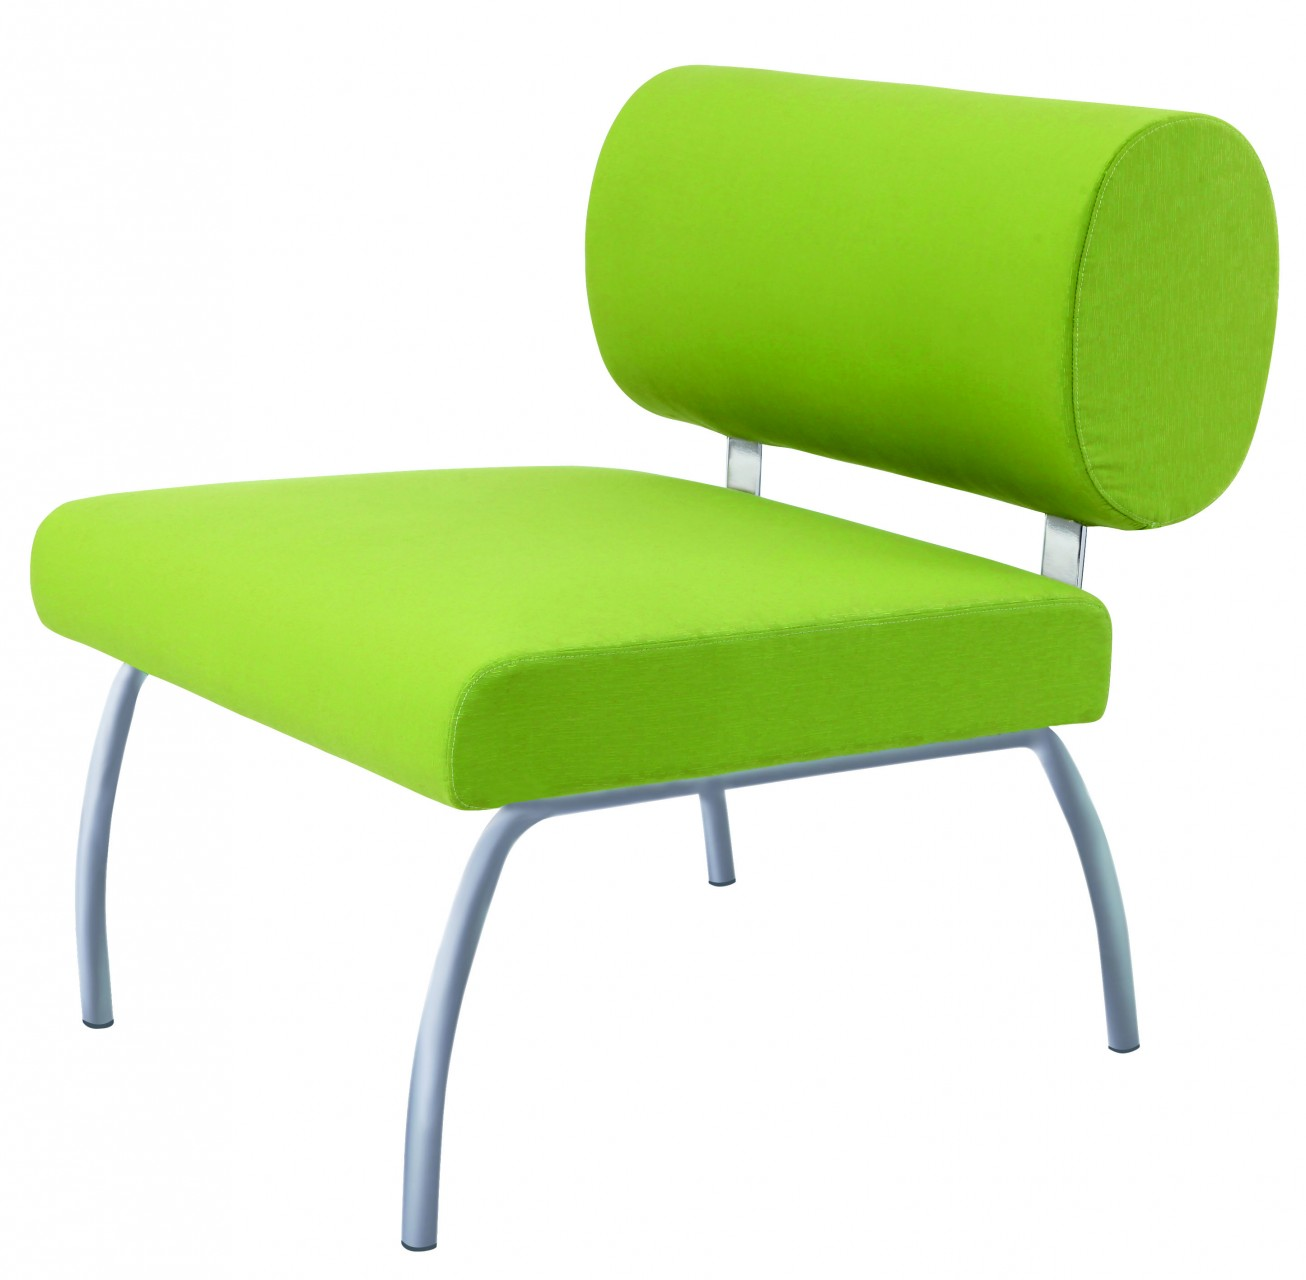 fauteuil d 39 accueil welly achat fauteuils d 39 accueil canap s chaises salle d 39 attente 314 00. Black Bedroom Furniture Sets. Home Design Ideas